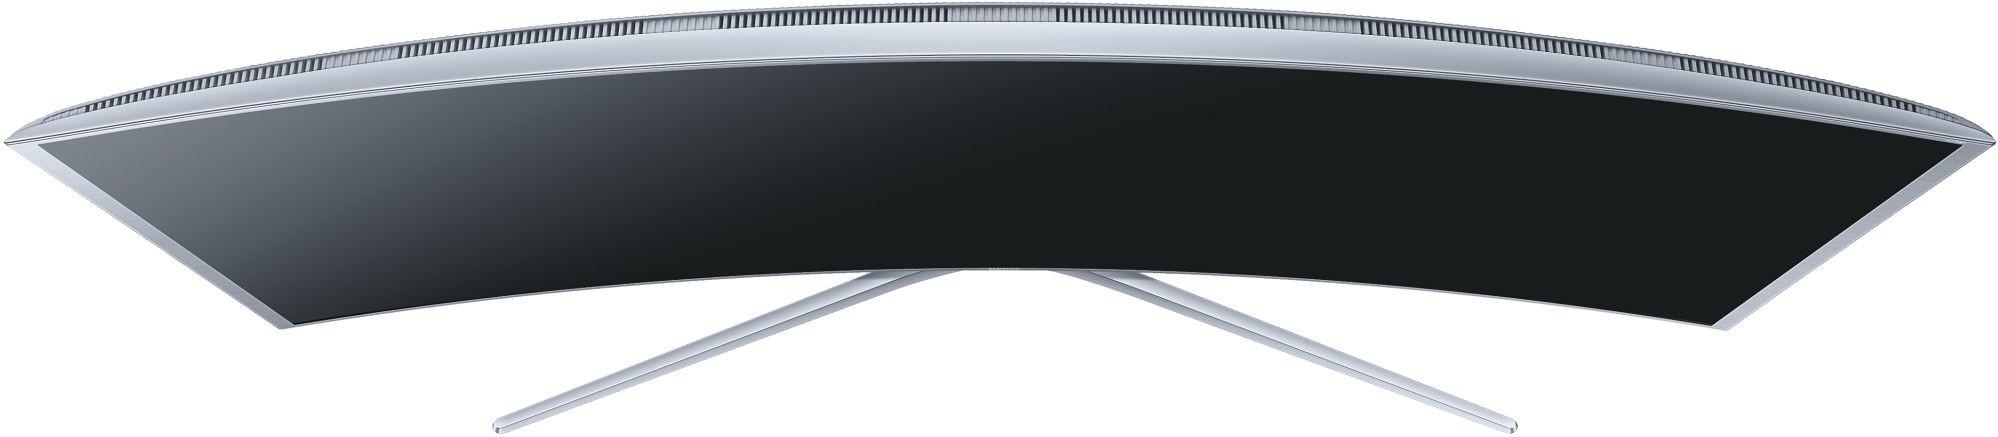 ue55js9090qxzg silber samsung av. Black Bedroom Furniture Sets. Home Design Ideas